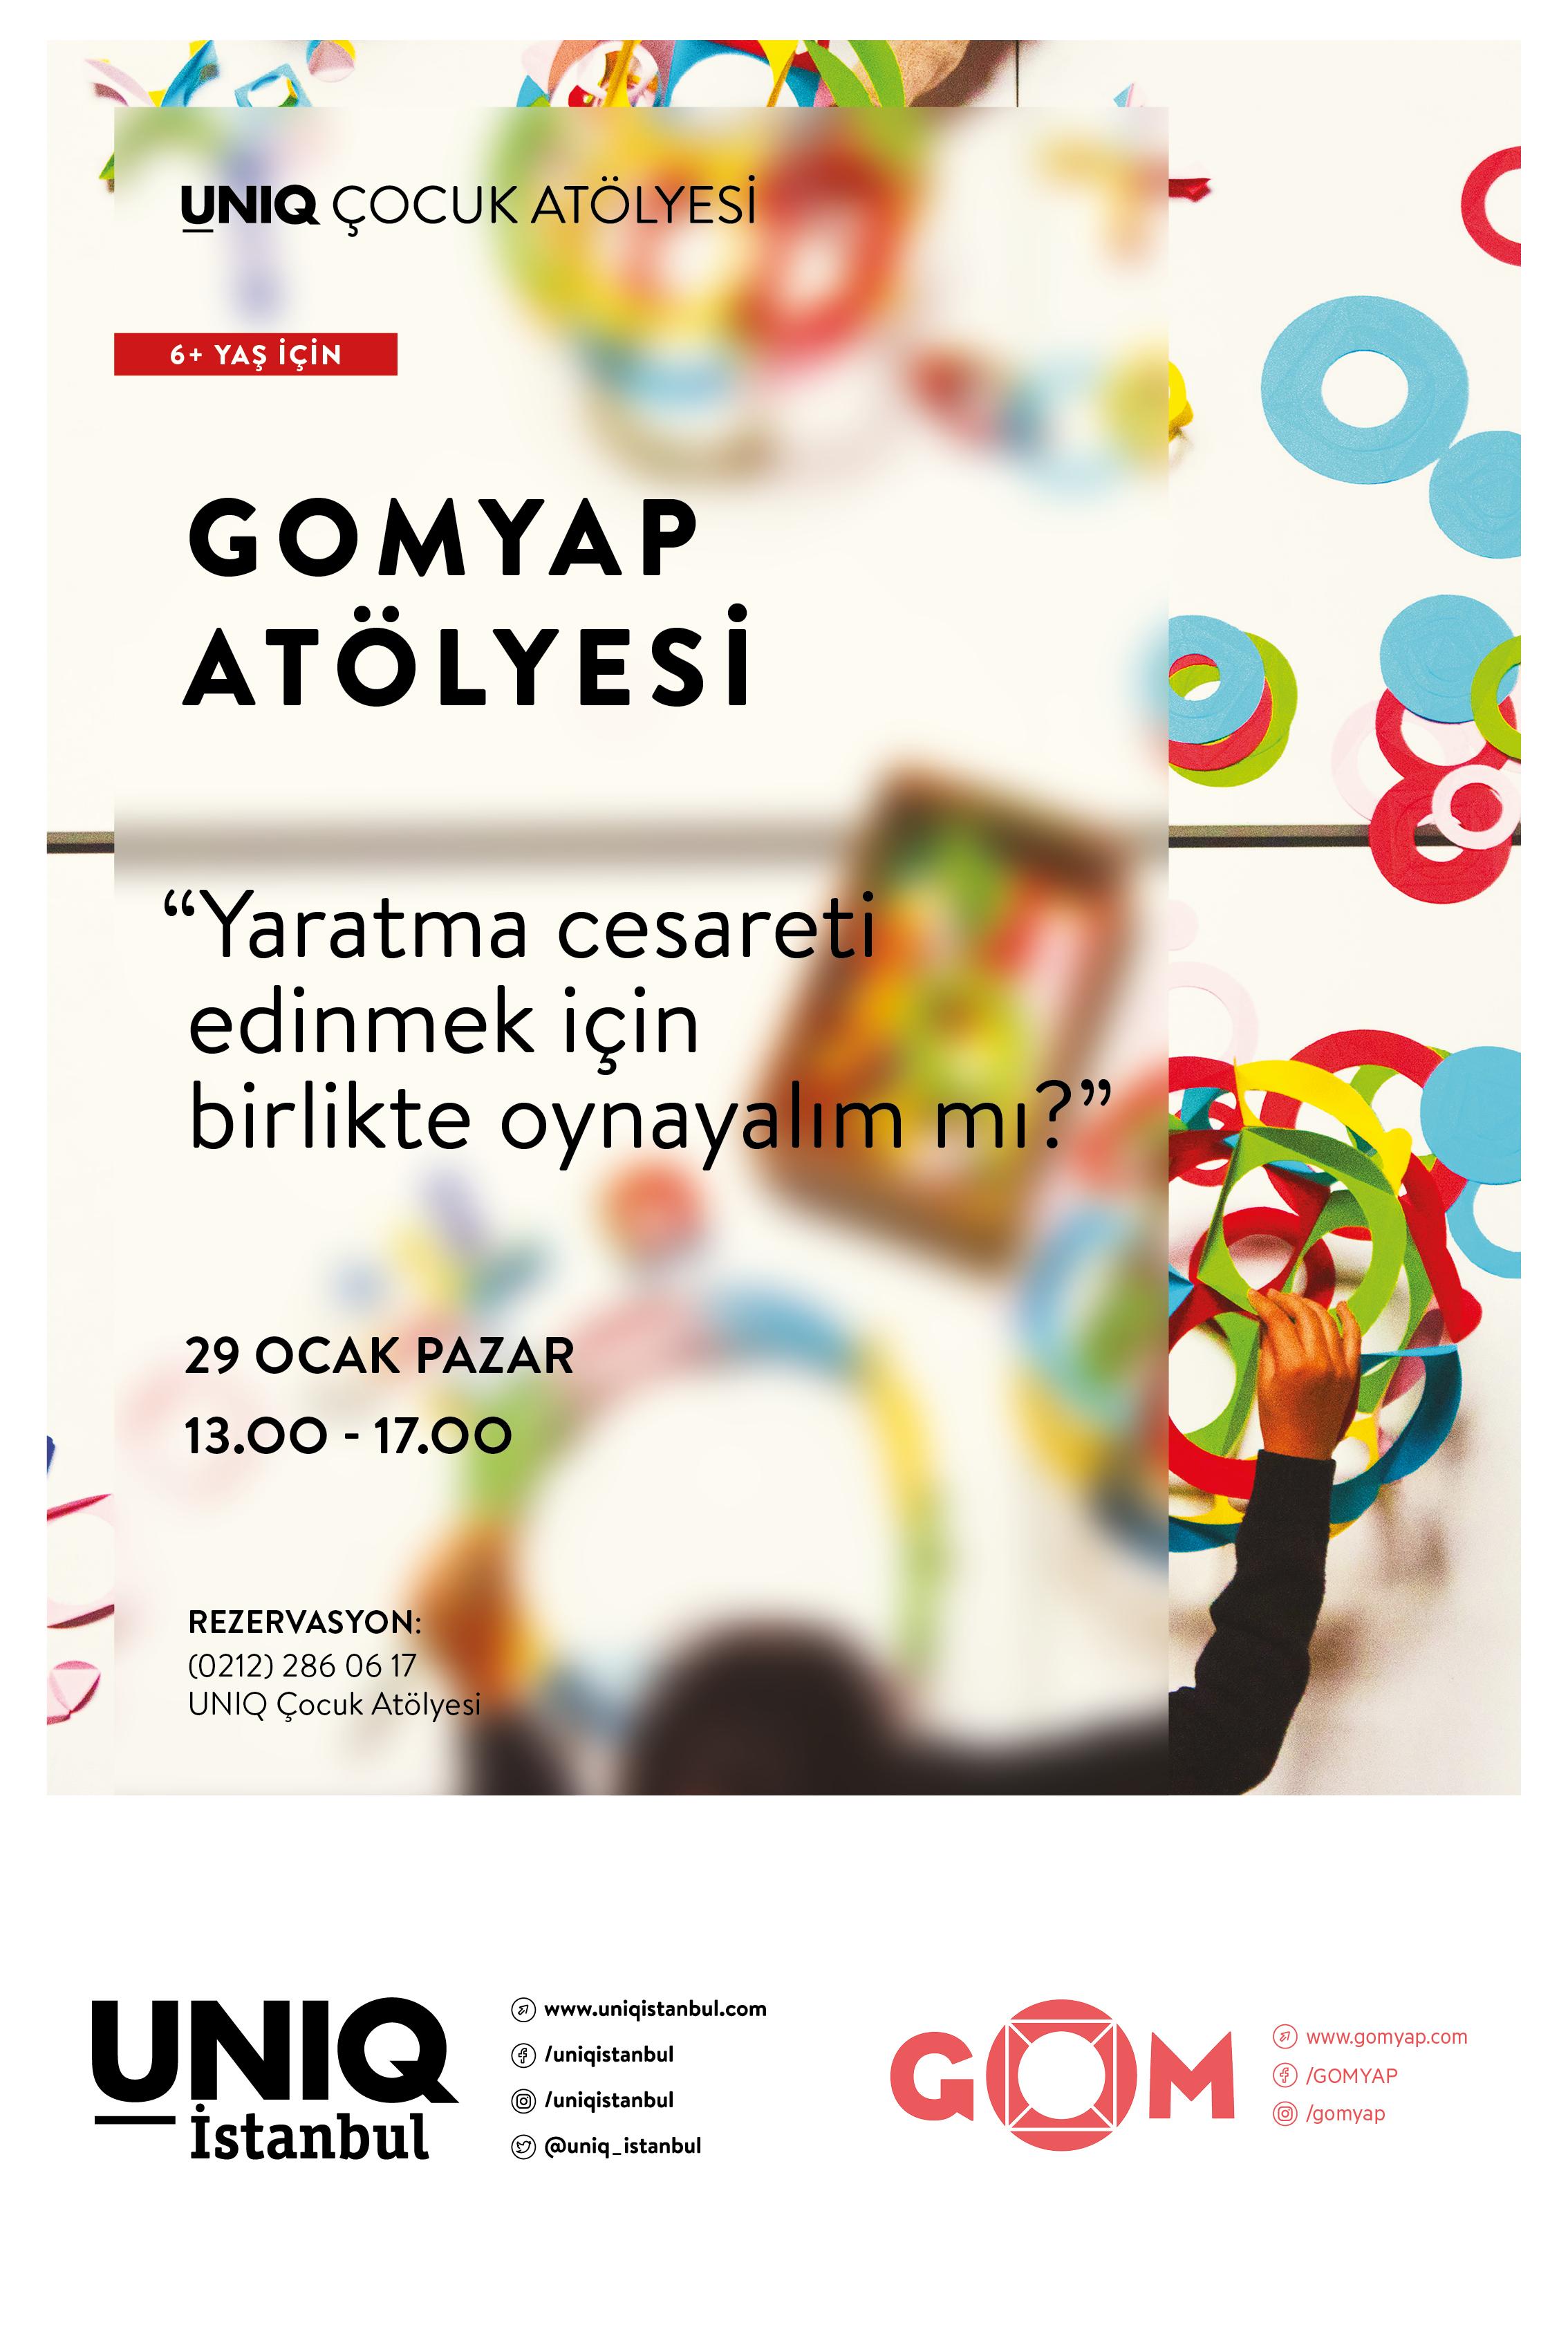 Cocuk-atolyesi-Gom-80x120-poster (1)